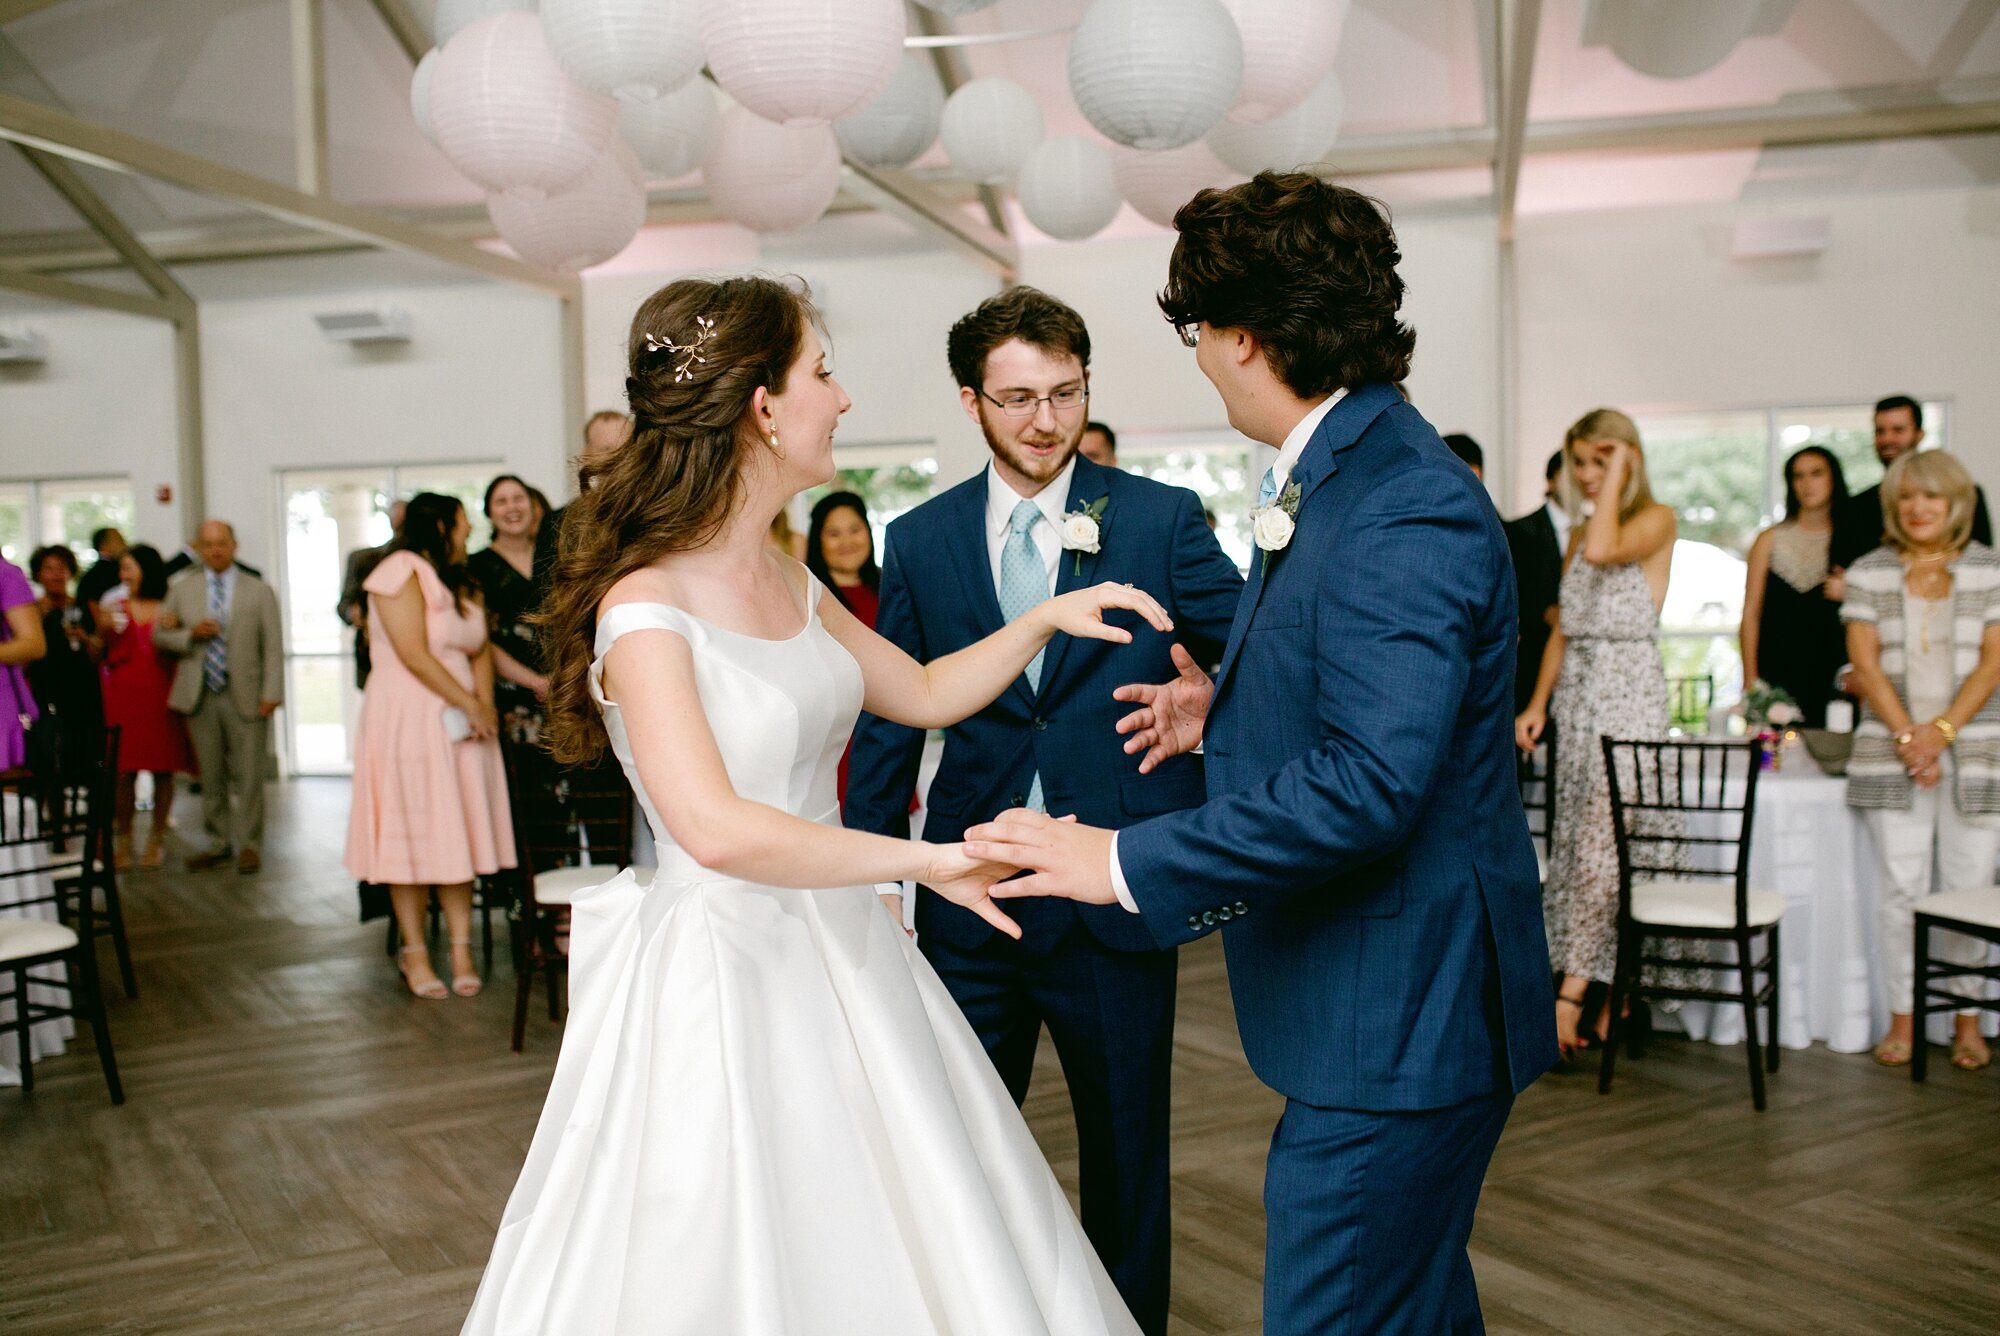 Bay_St_Louis_Wedding_Photographer_0562.jpg